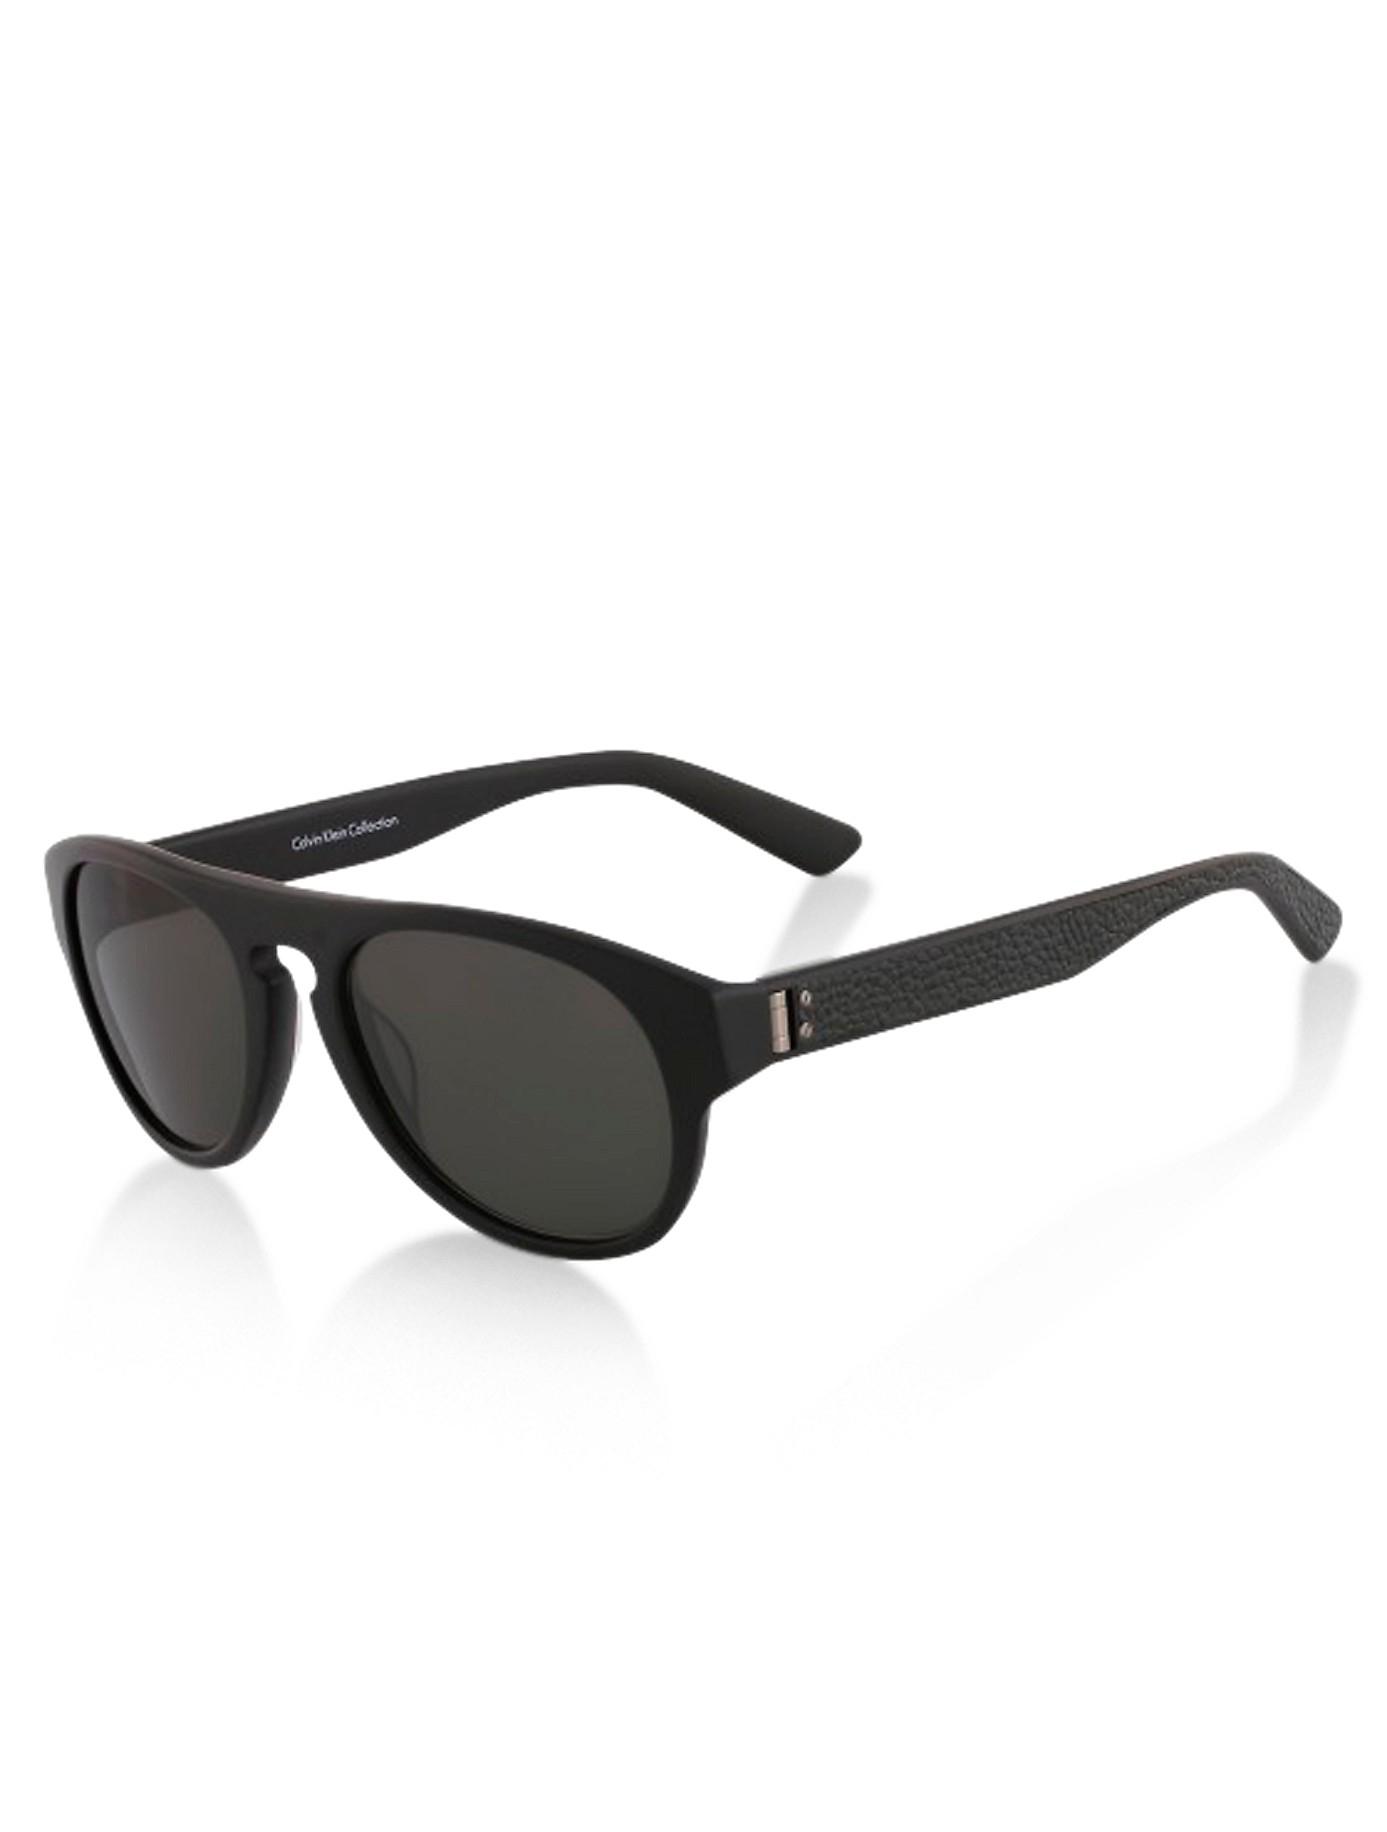 Calvin klein Collection Wayfarer-Inspired Sunglasses in Black | Lyst